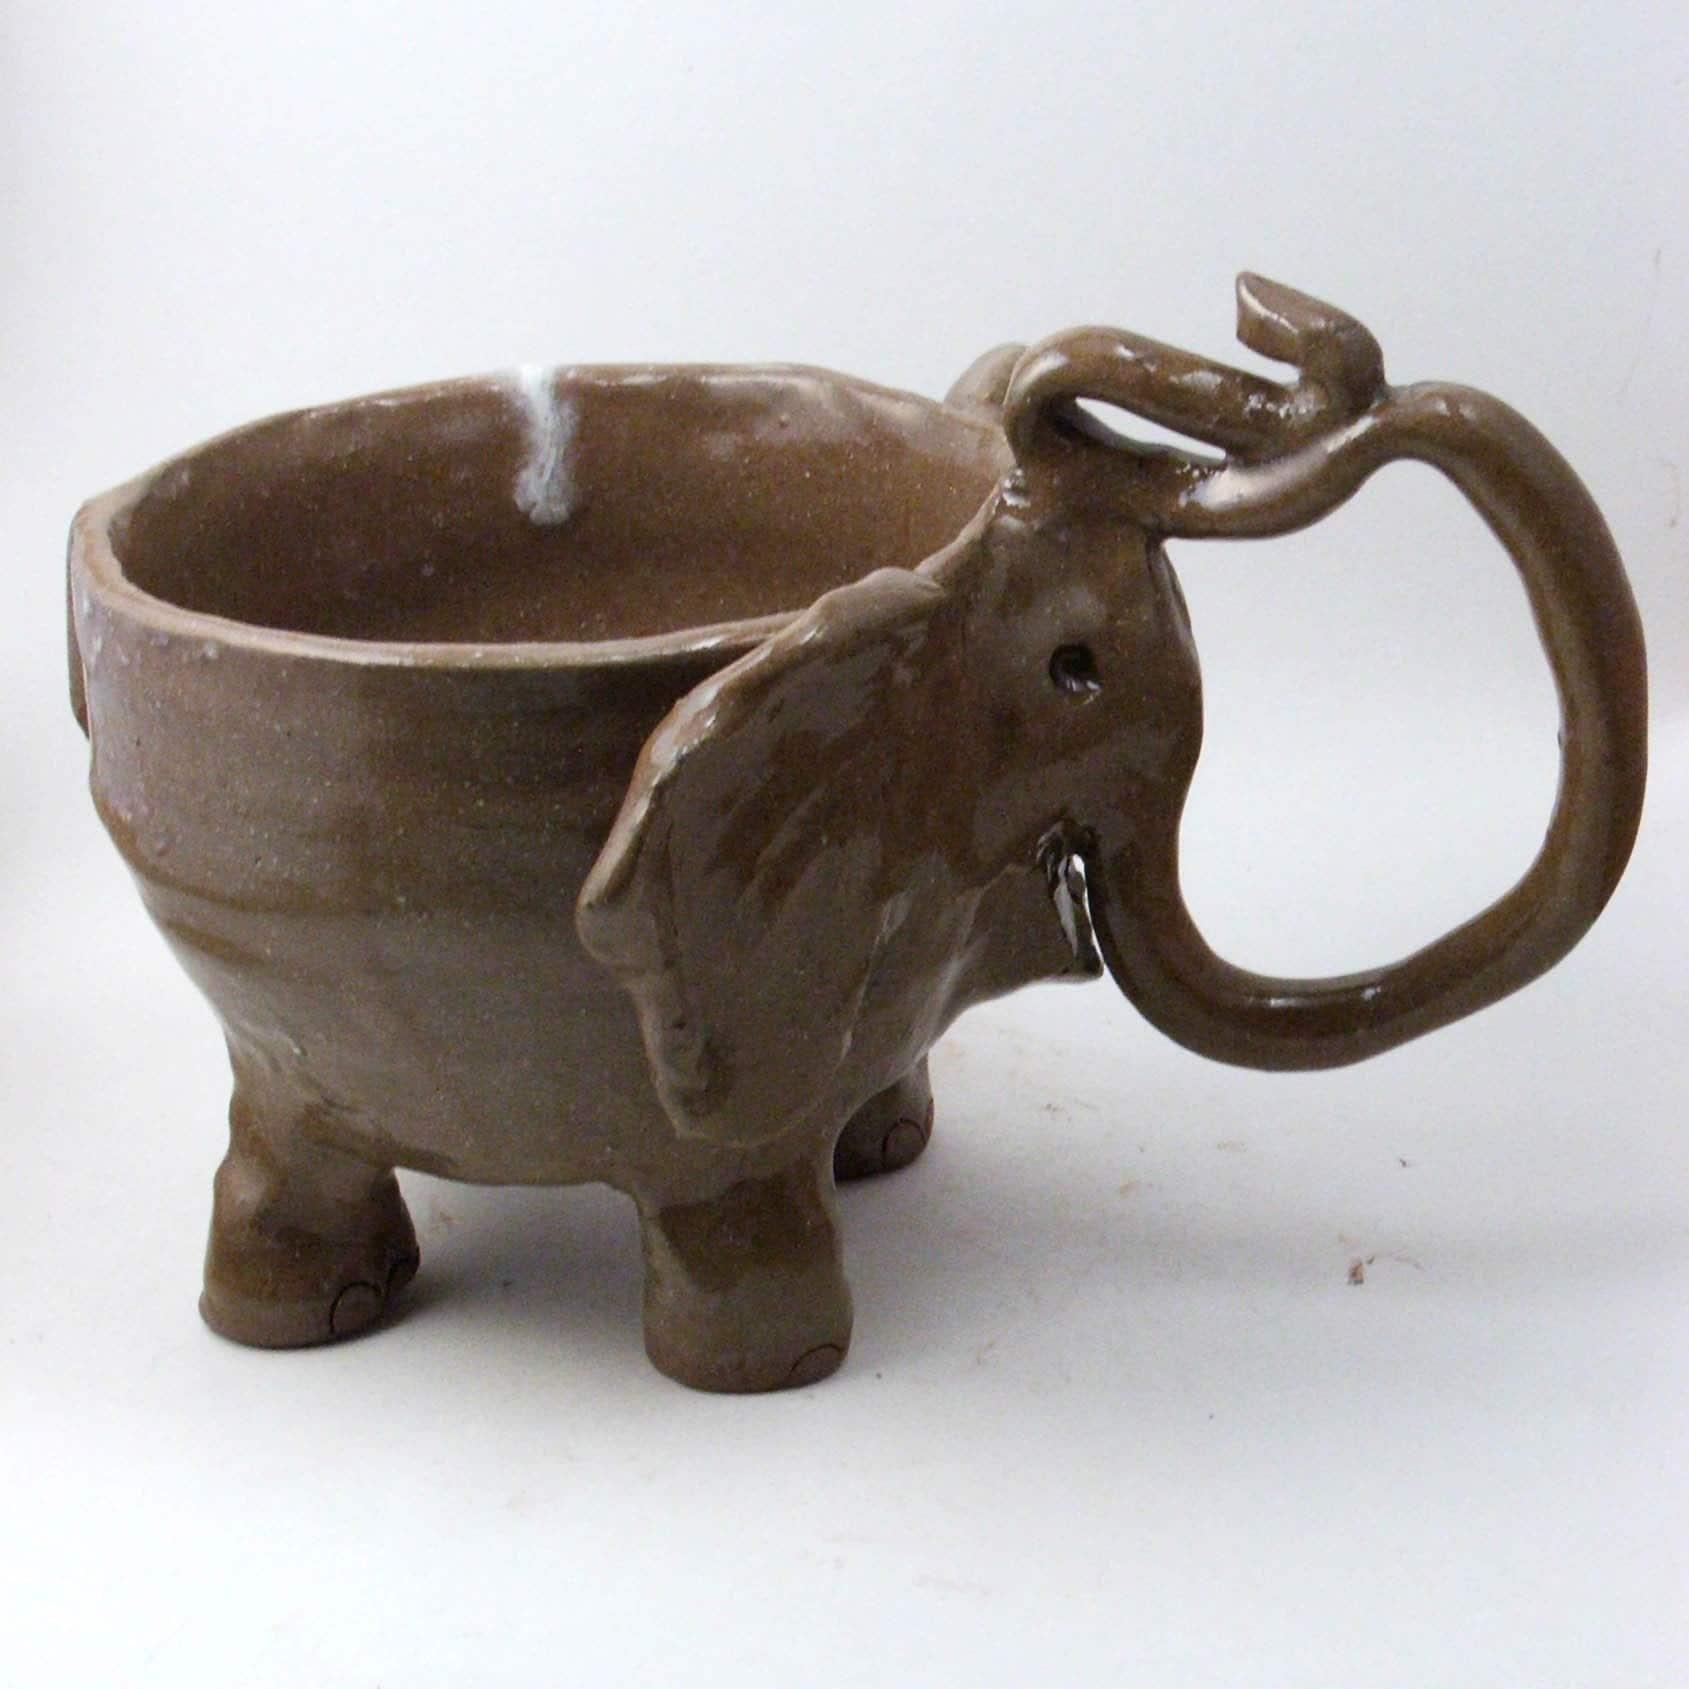 Ceramic animal cup the art room for Clay mug ideas